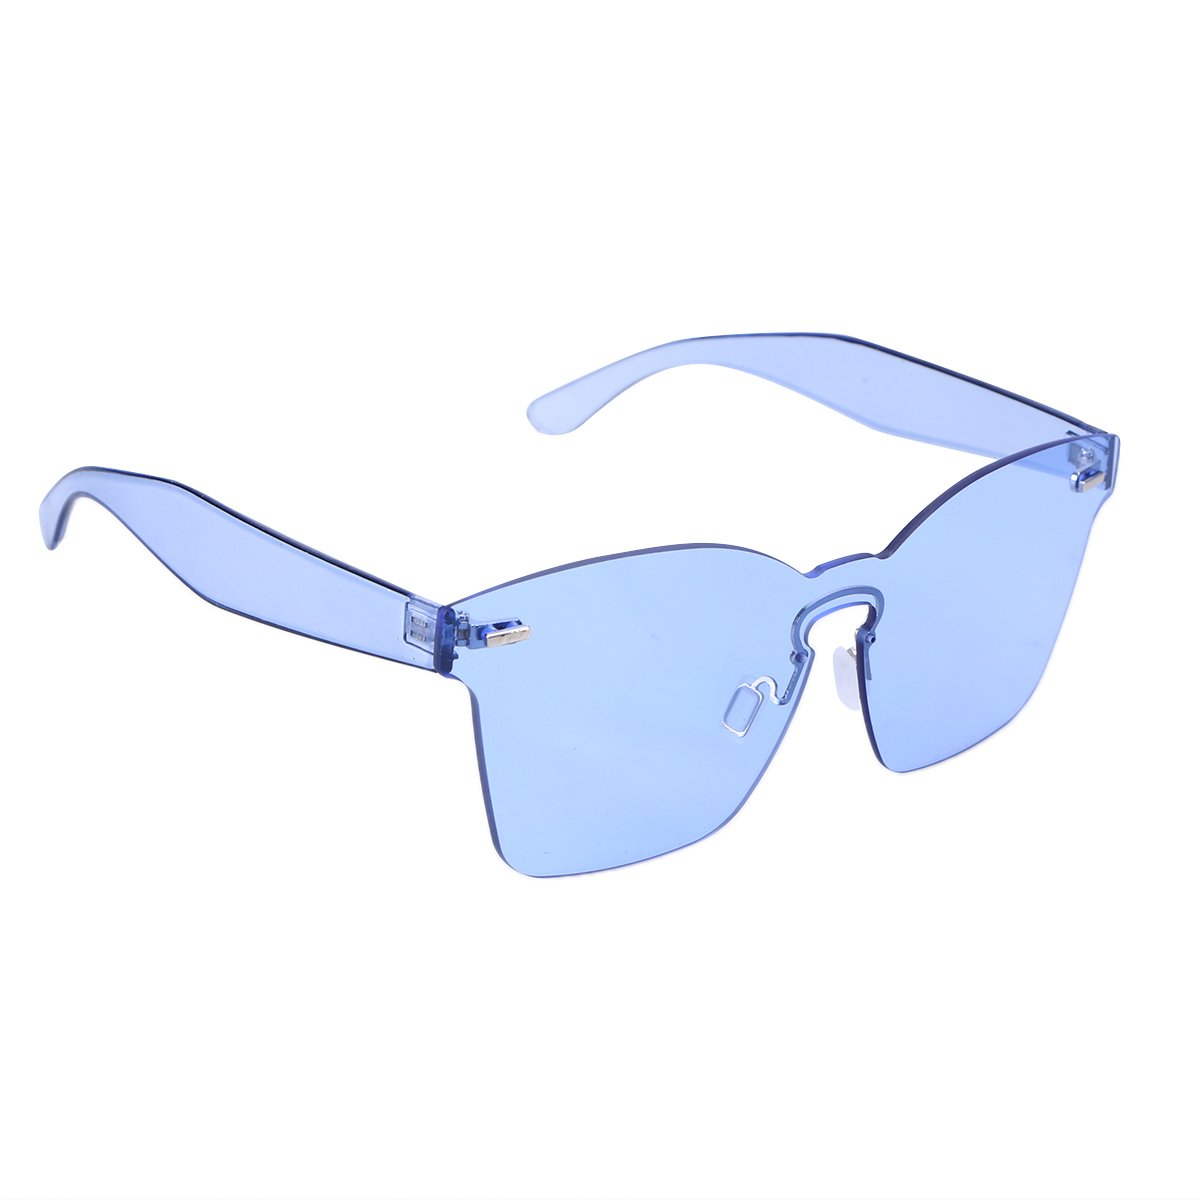 7b5a5035269 LUOEM Rimless Sunglasses Novelty Pratical Beach Seaside Sunglass Mirror  Summer Eyewear for Men Women (Blue)  Amazon.in  Clothing   Accessories